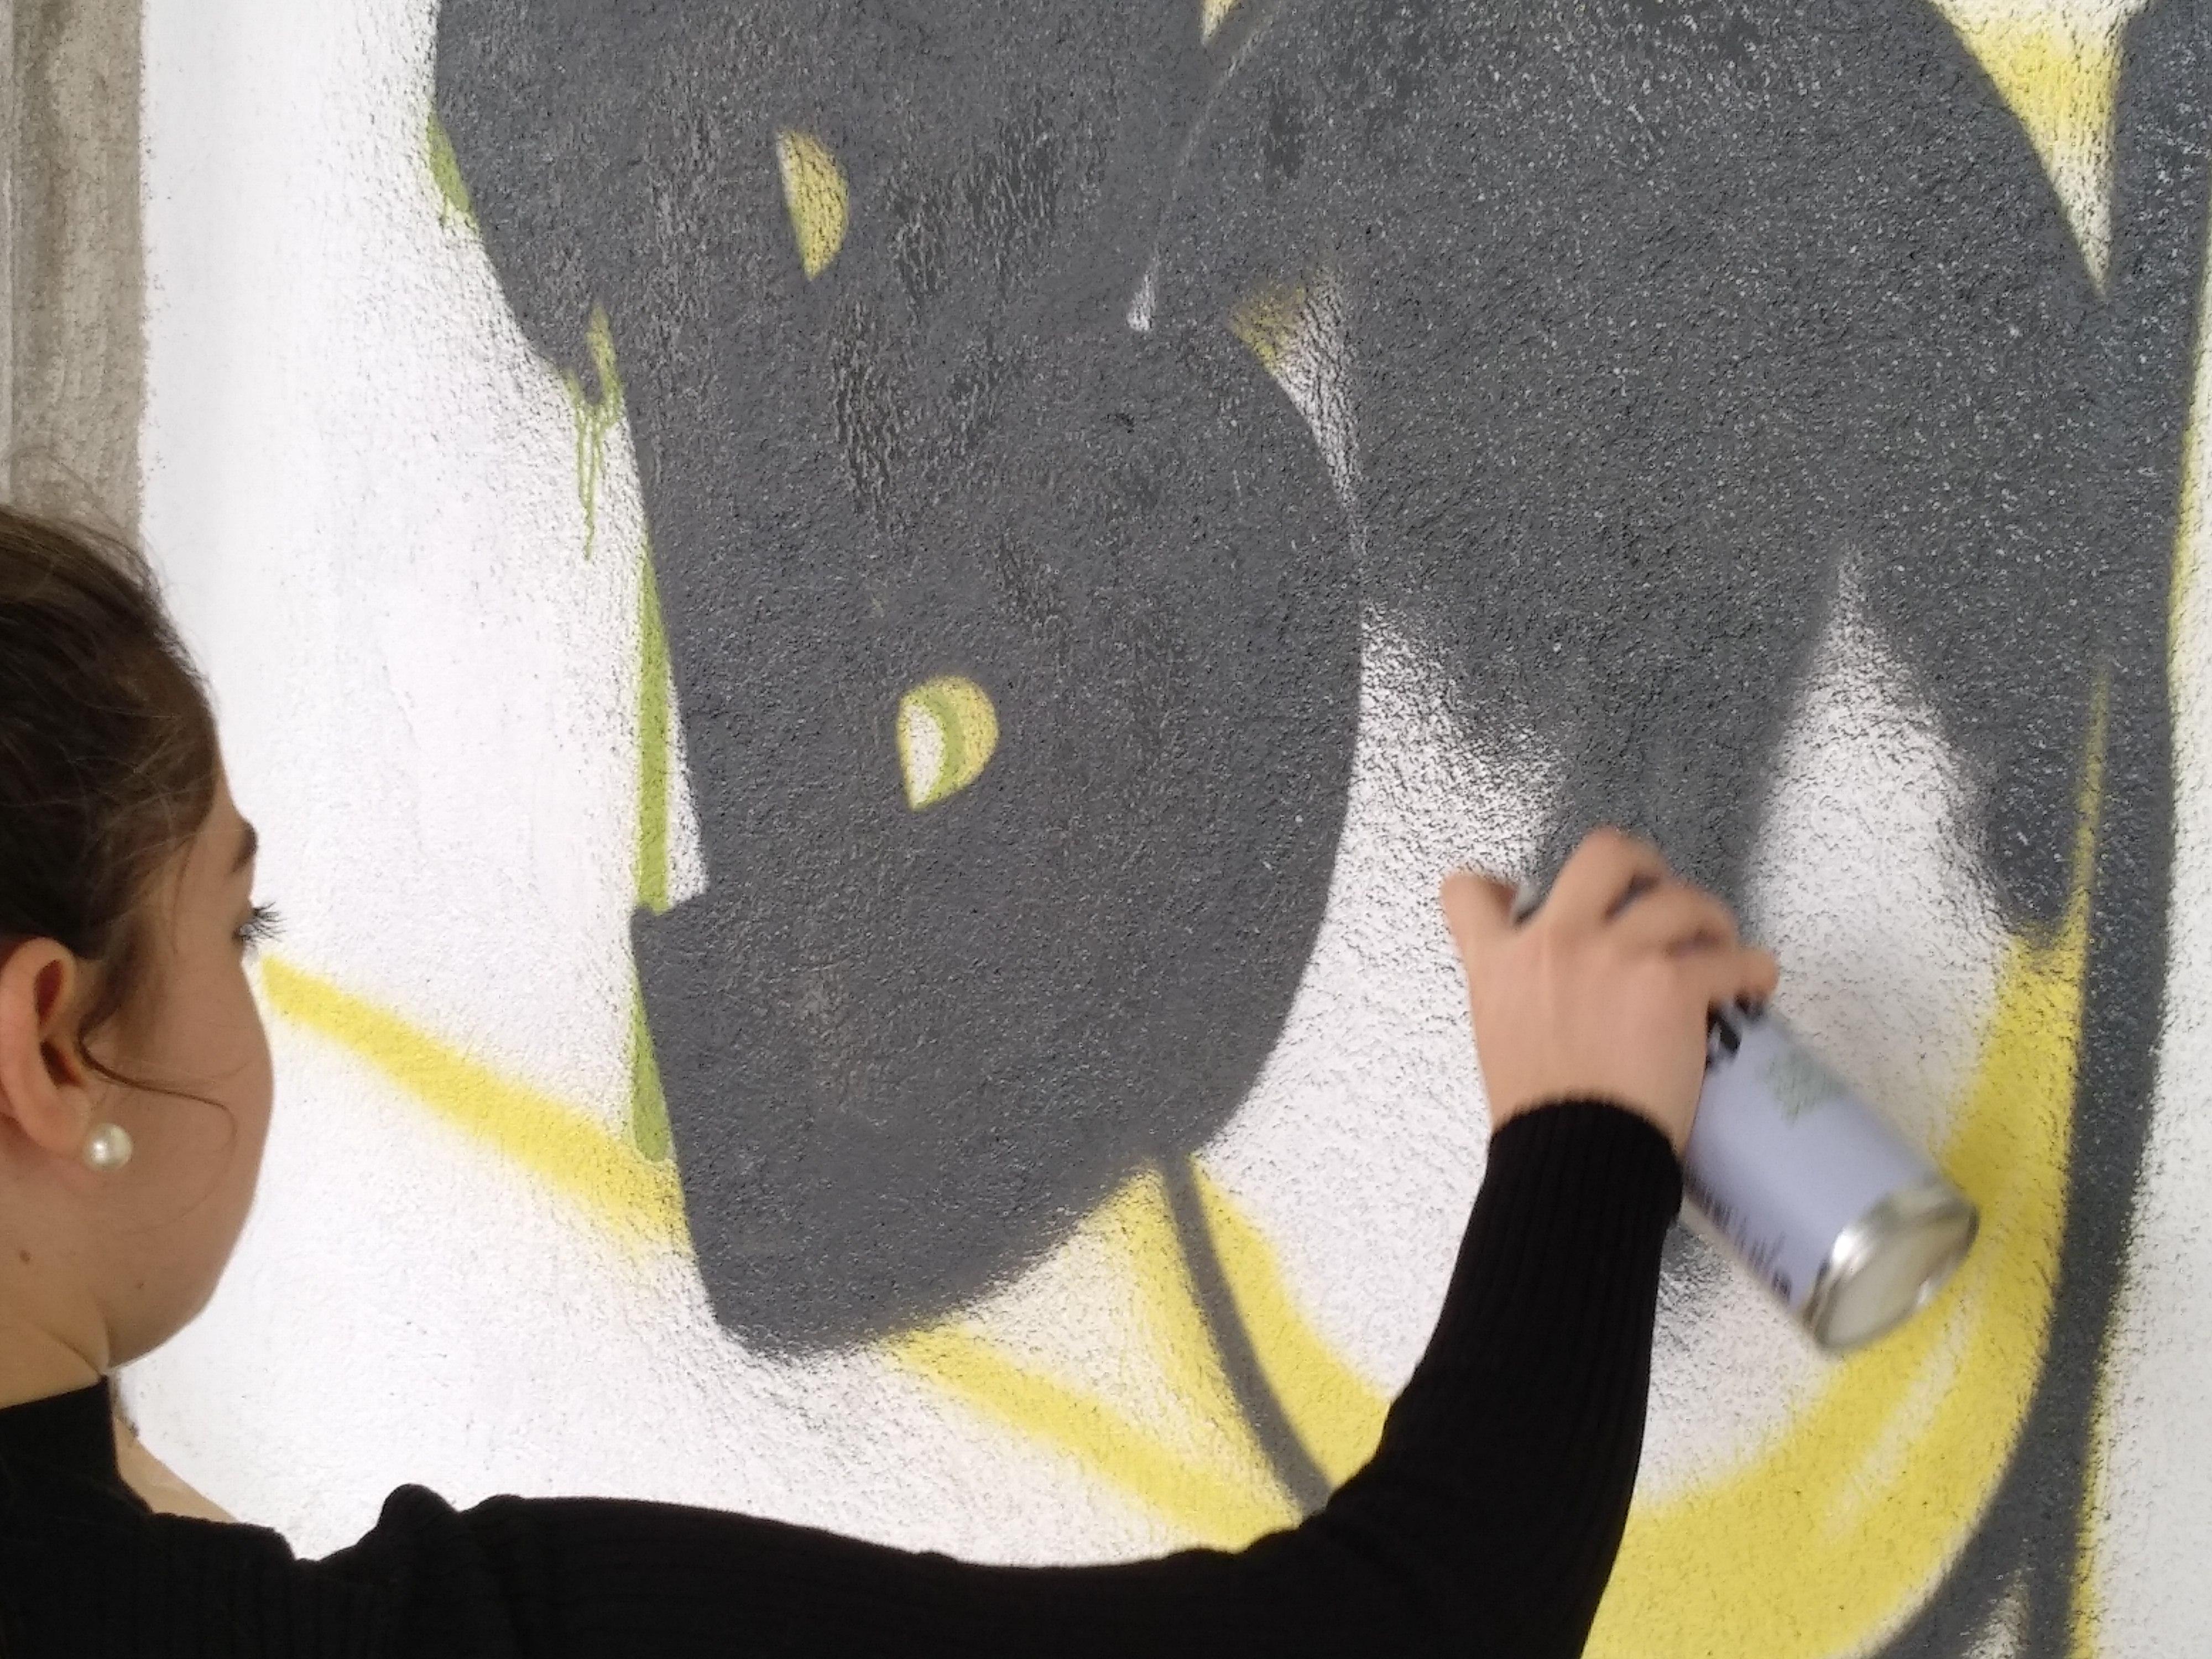 Tenim un nou grafiti: tu ets la bomba!